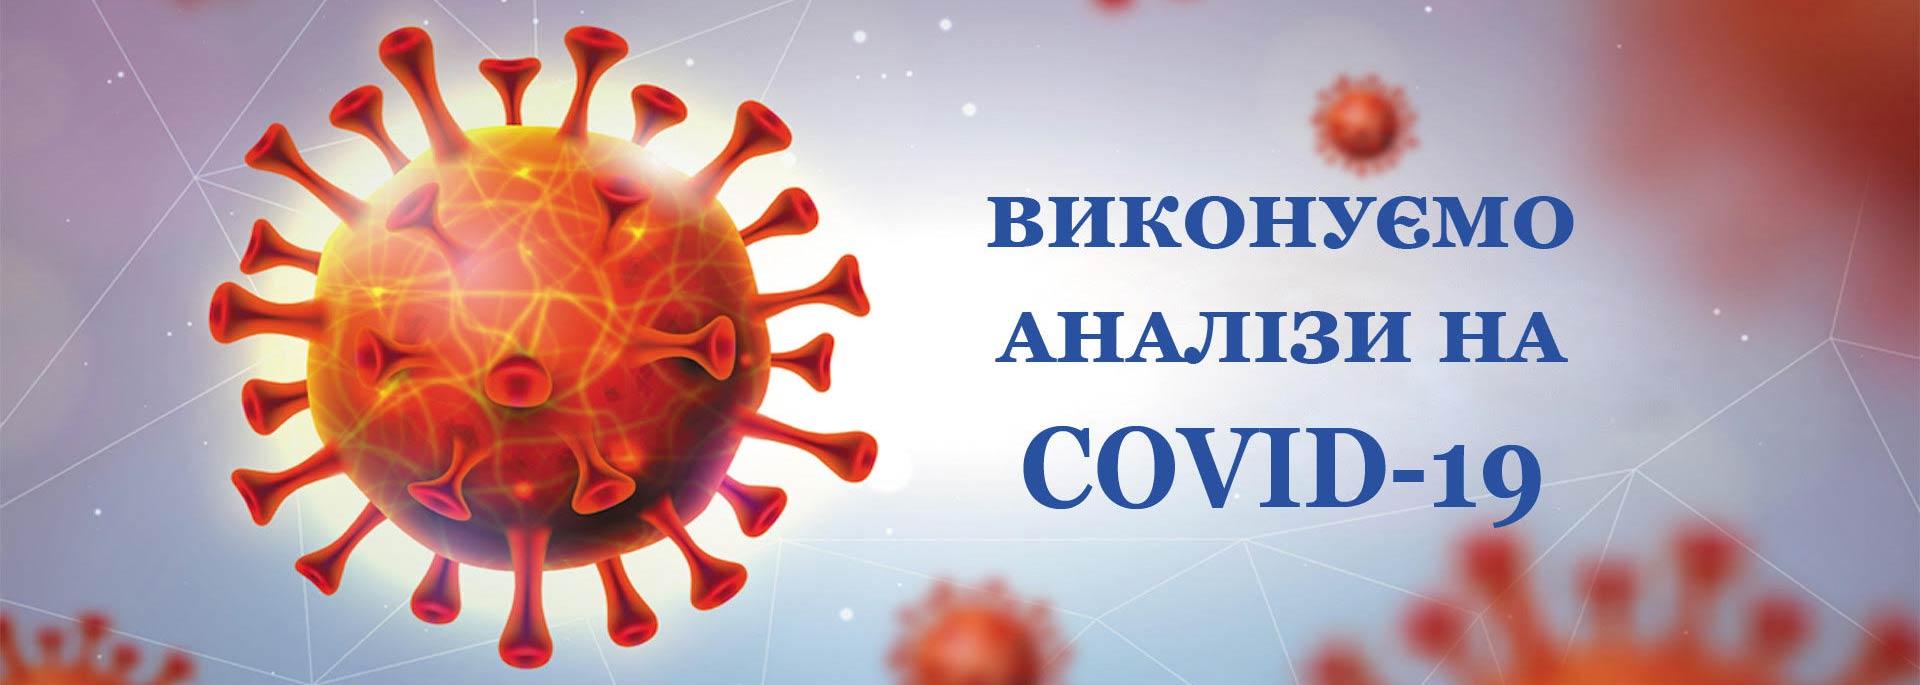 Тести на COVID-19 (коронавірус): ПЛР-тест, антитіла (IgA, IgM, IgG)